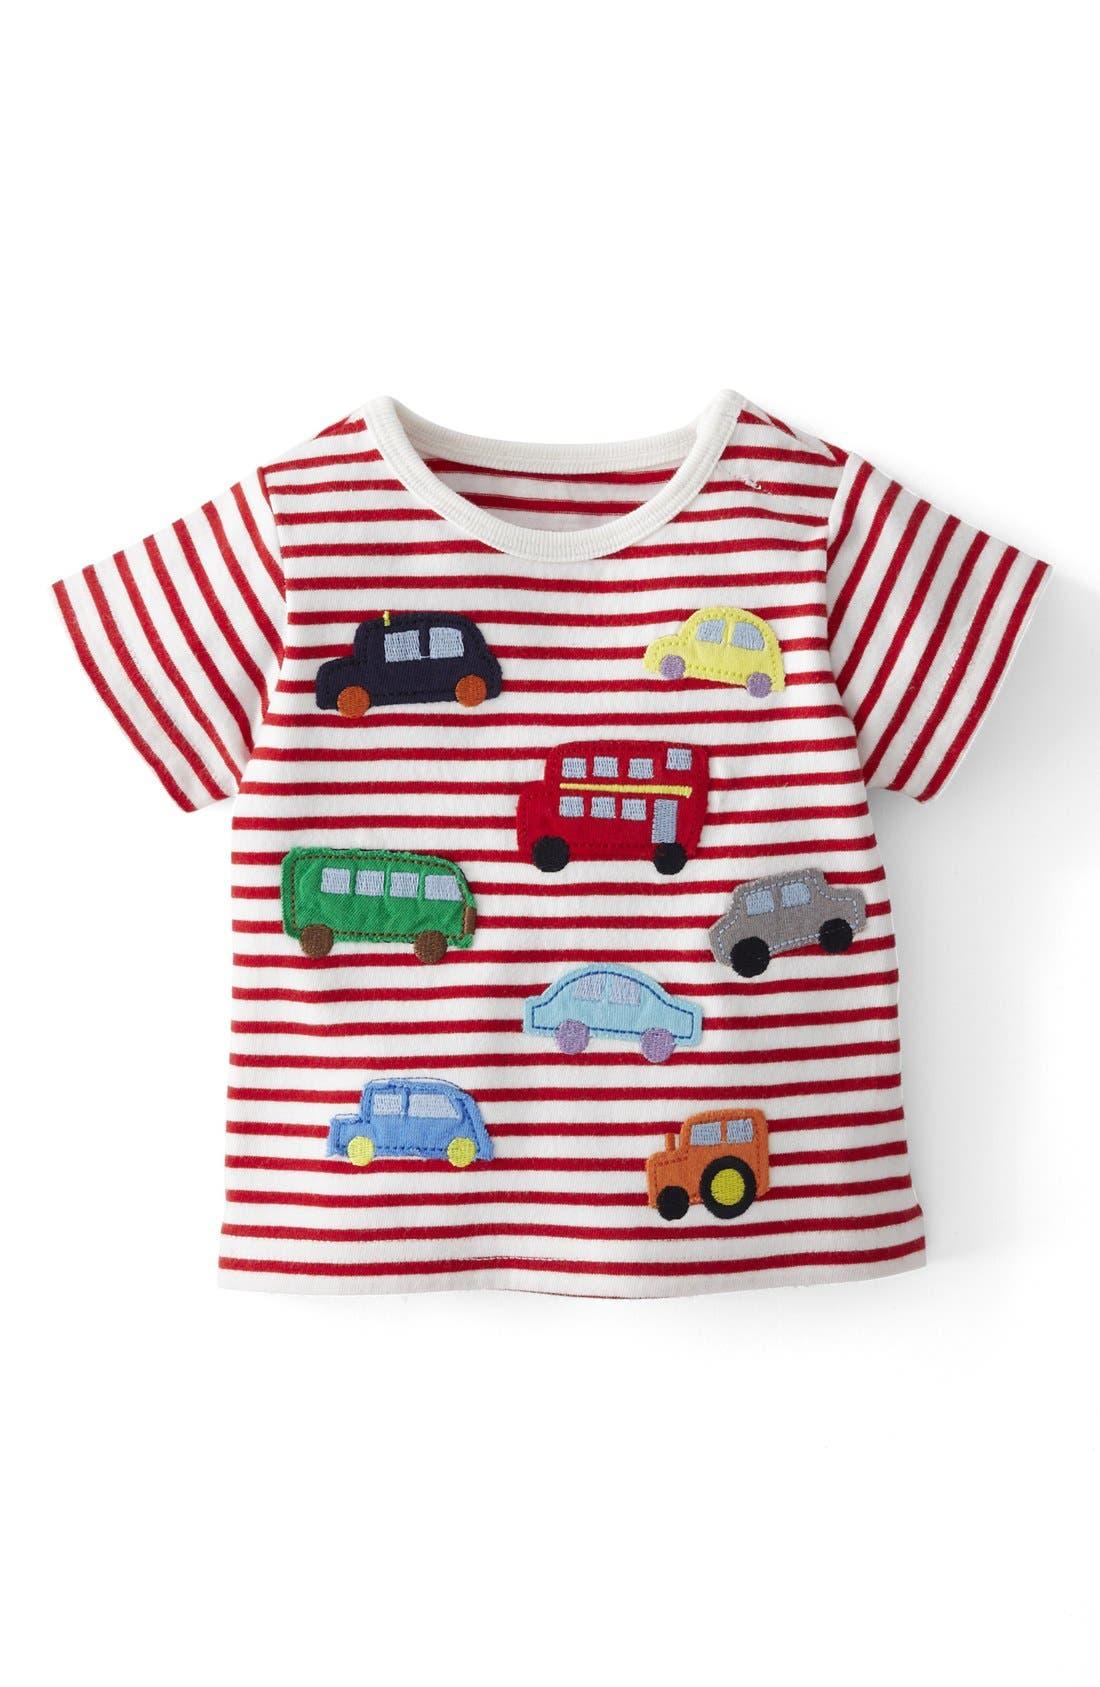 Alternate Image 1 Selected - Mini Boden 'Little Vehicles' Cotton T-Shirt (Baby Boys)